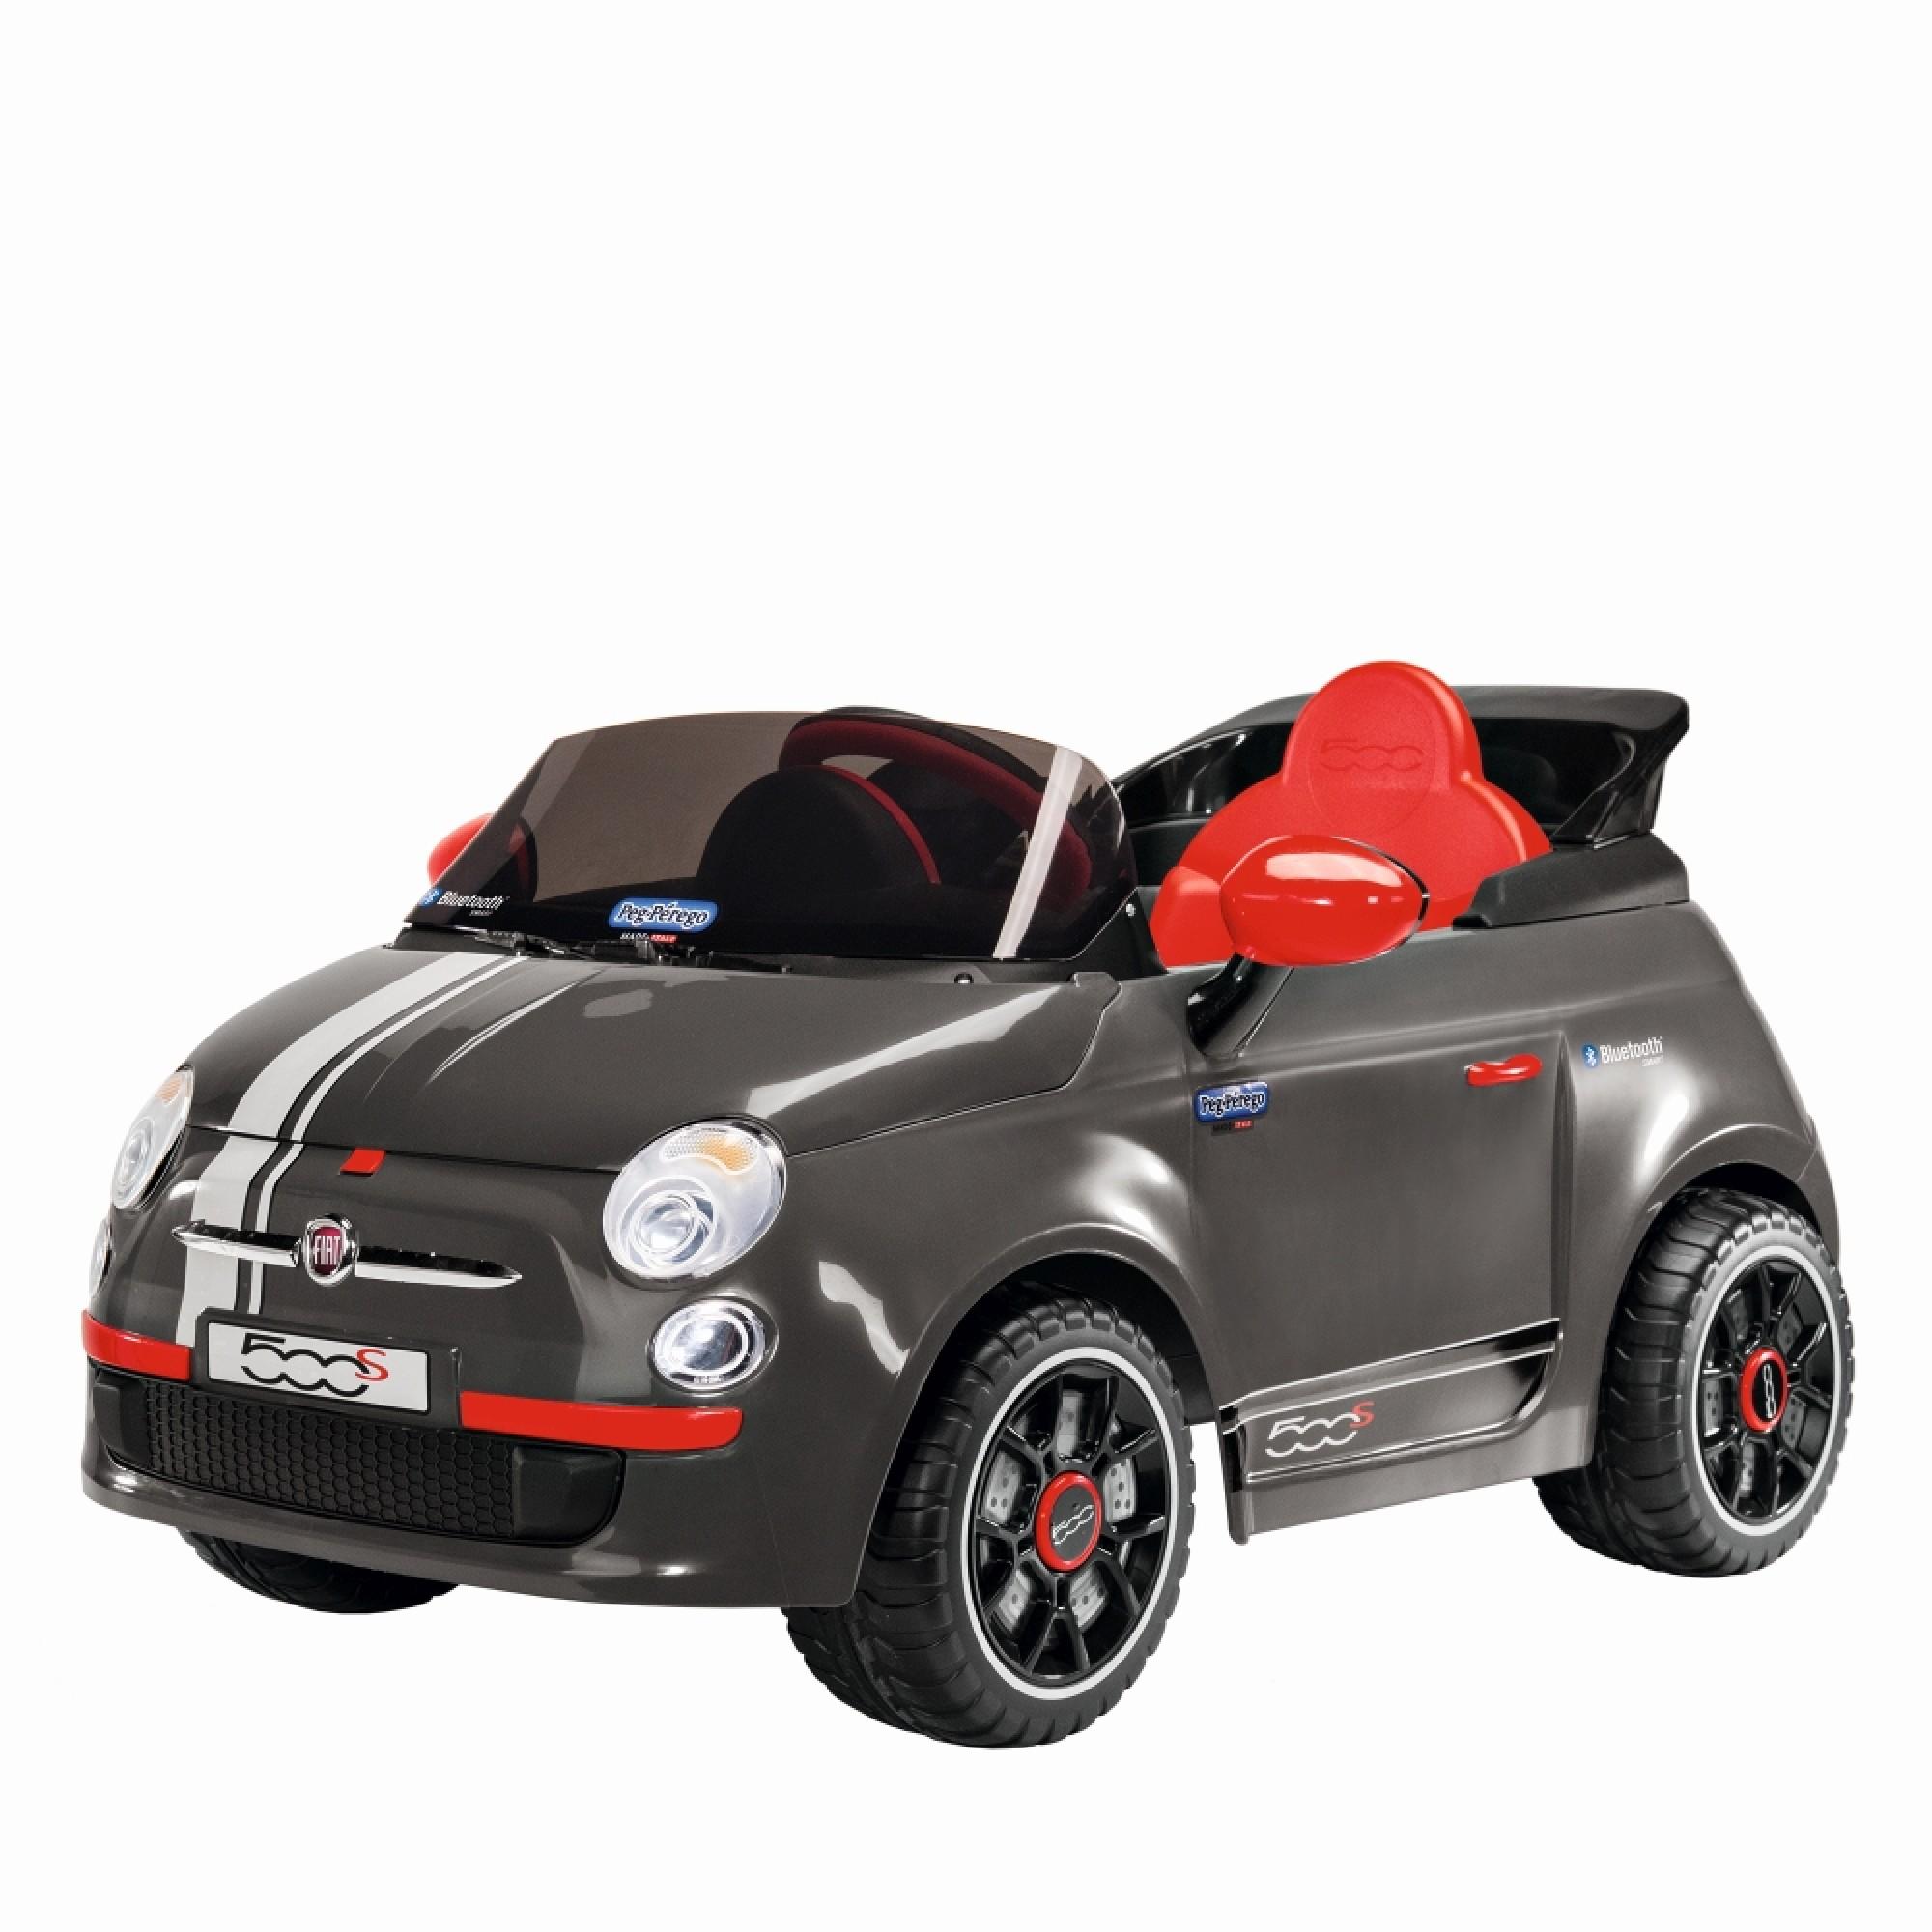 Masina, Fiat 500 S, Peg Perego, Telecomanda